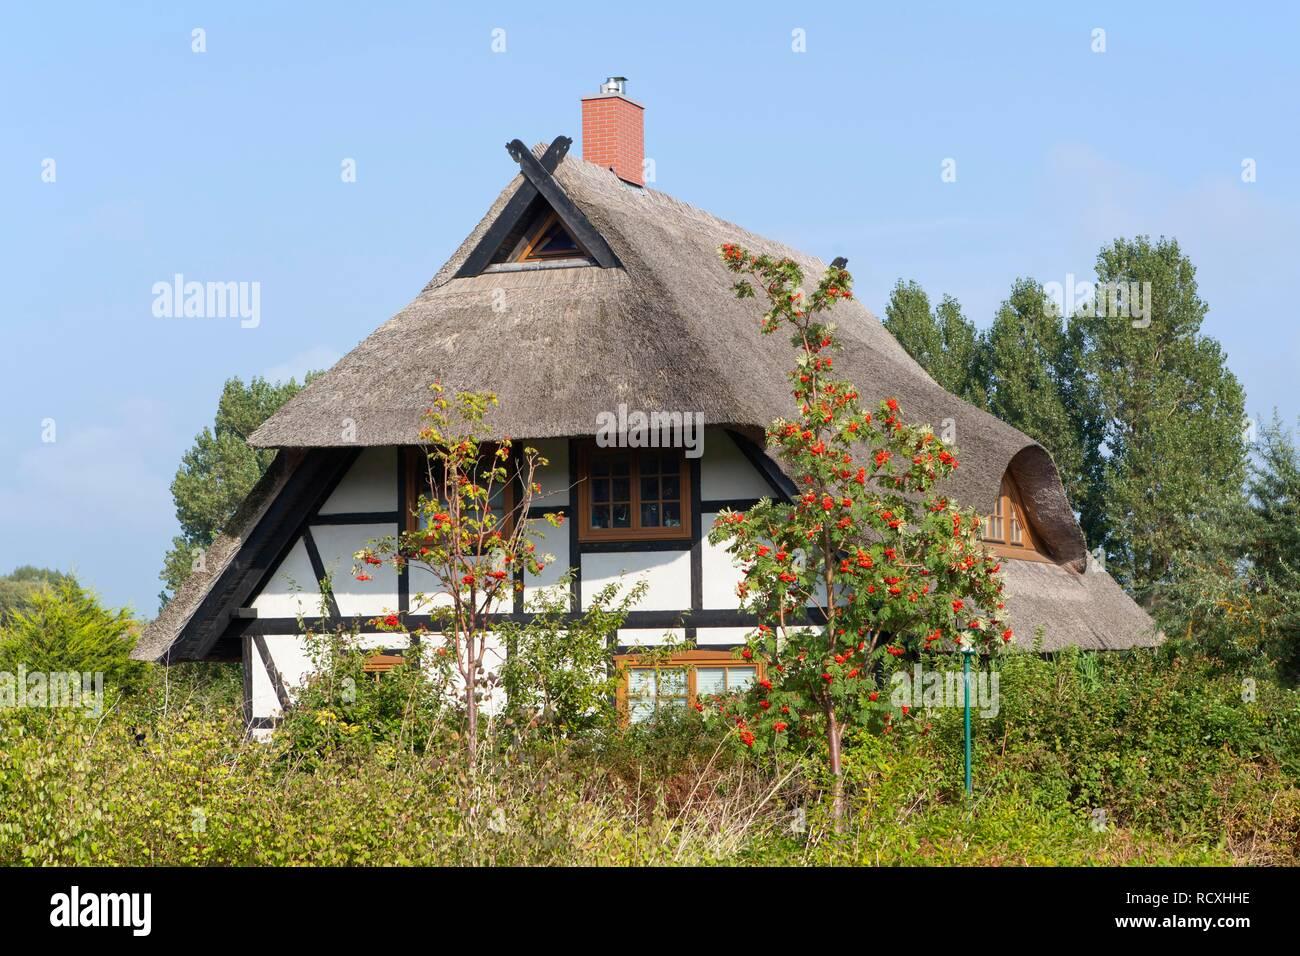 Thatched house, Ahrenshoop, Darss, Mecklenburg-West Pomerania, PublicGround - Stock Image